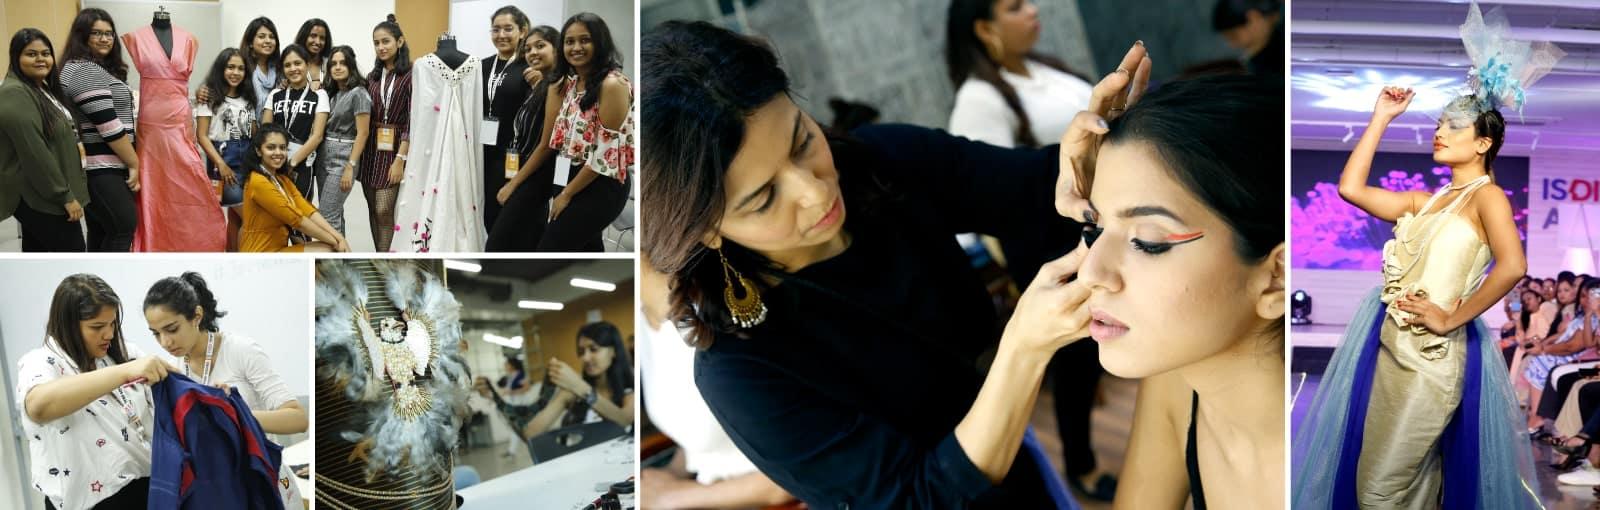 ISDI – Best School of Design & Innovation in Mumbai, India